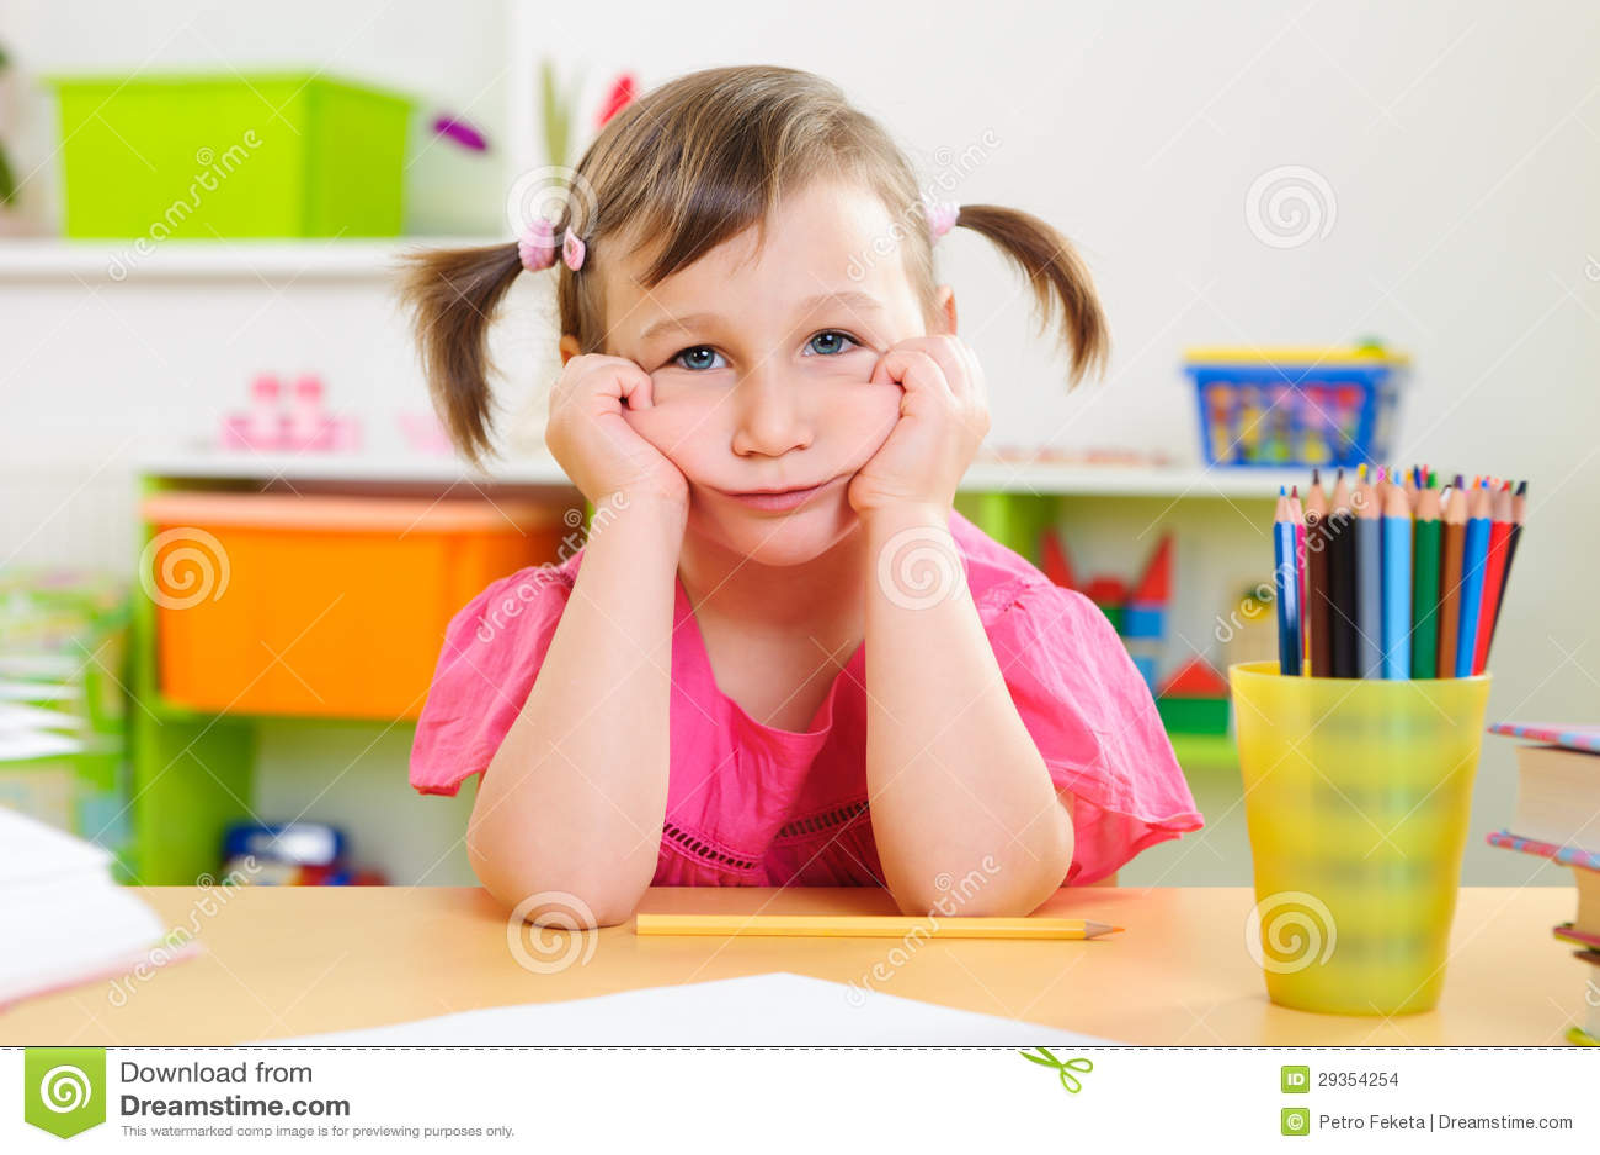 Upset little girl sitting at desk stock images image 29354254 - Desk girl image in ...